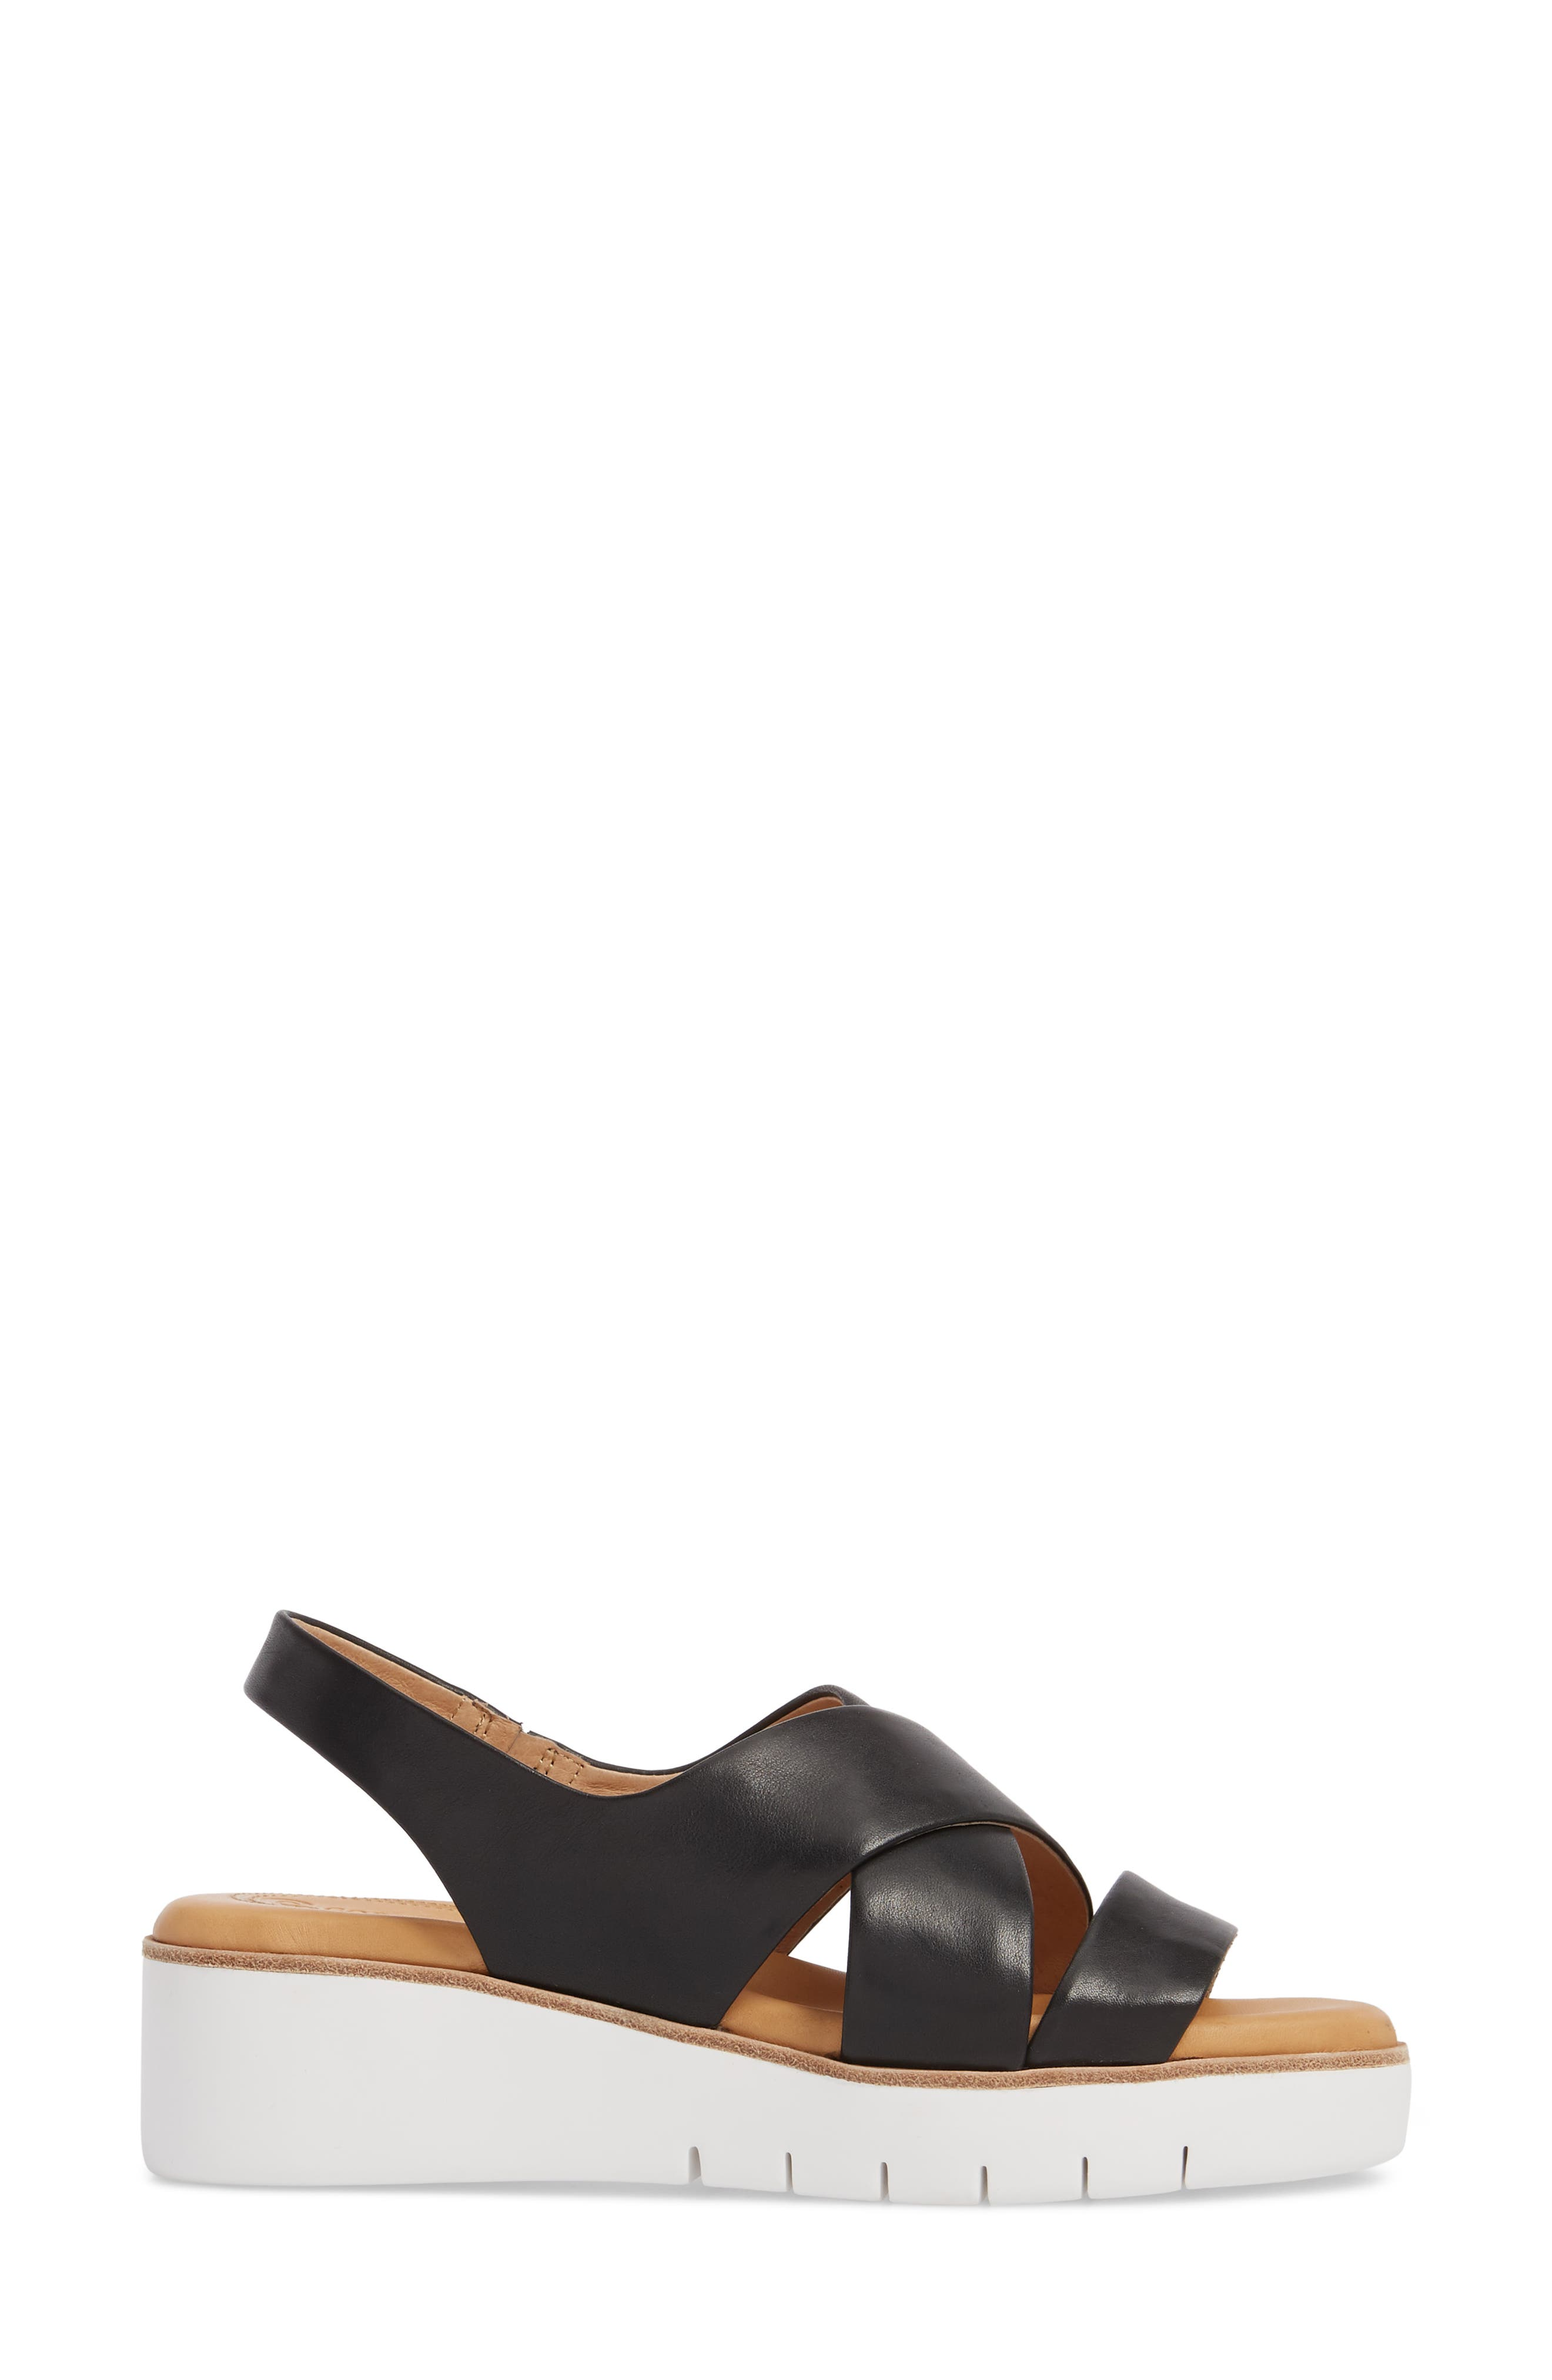 Brinney Wedge Sandal,                             Alternate thumbnail 3, color,                             BLACK LEATHER